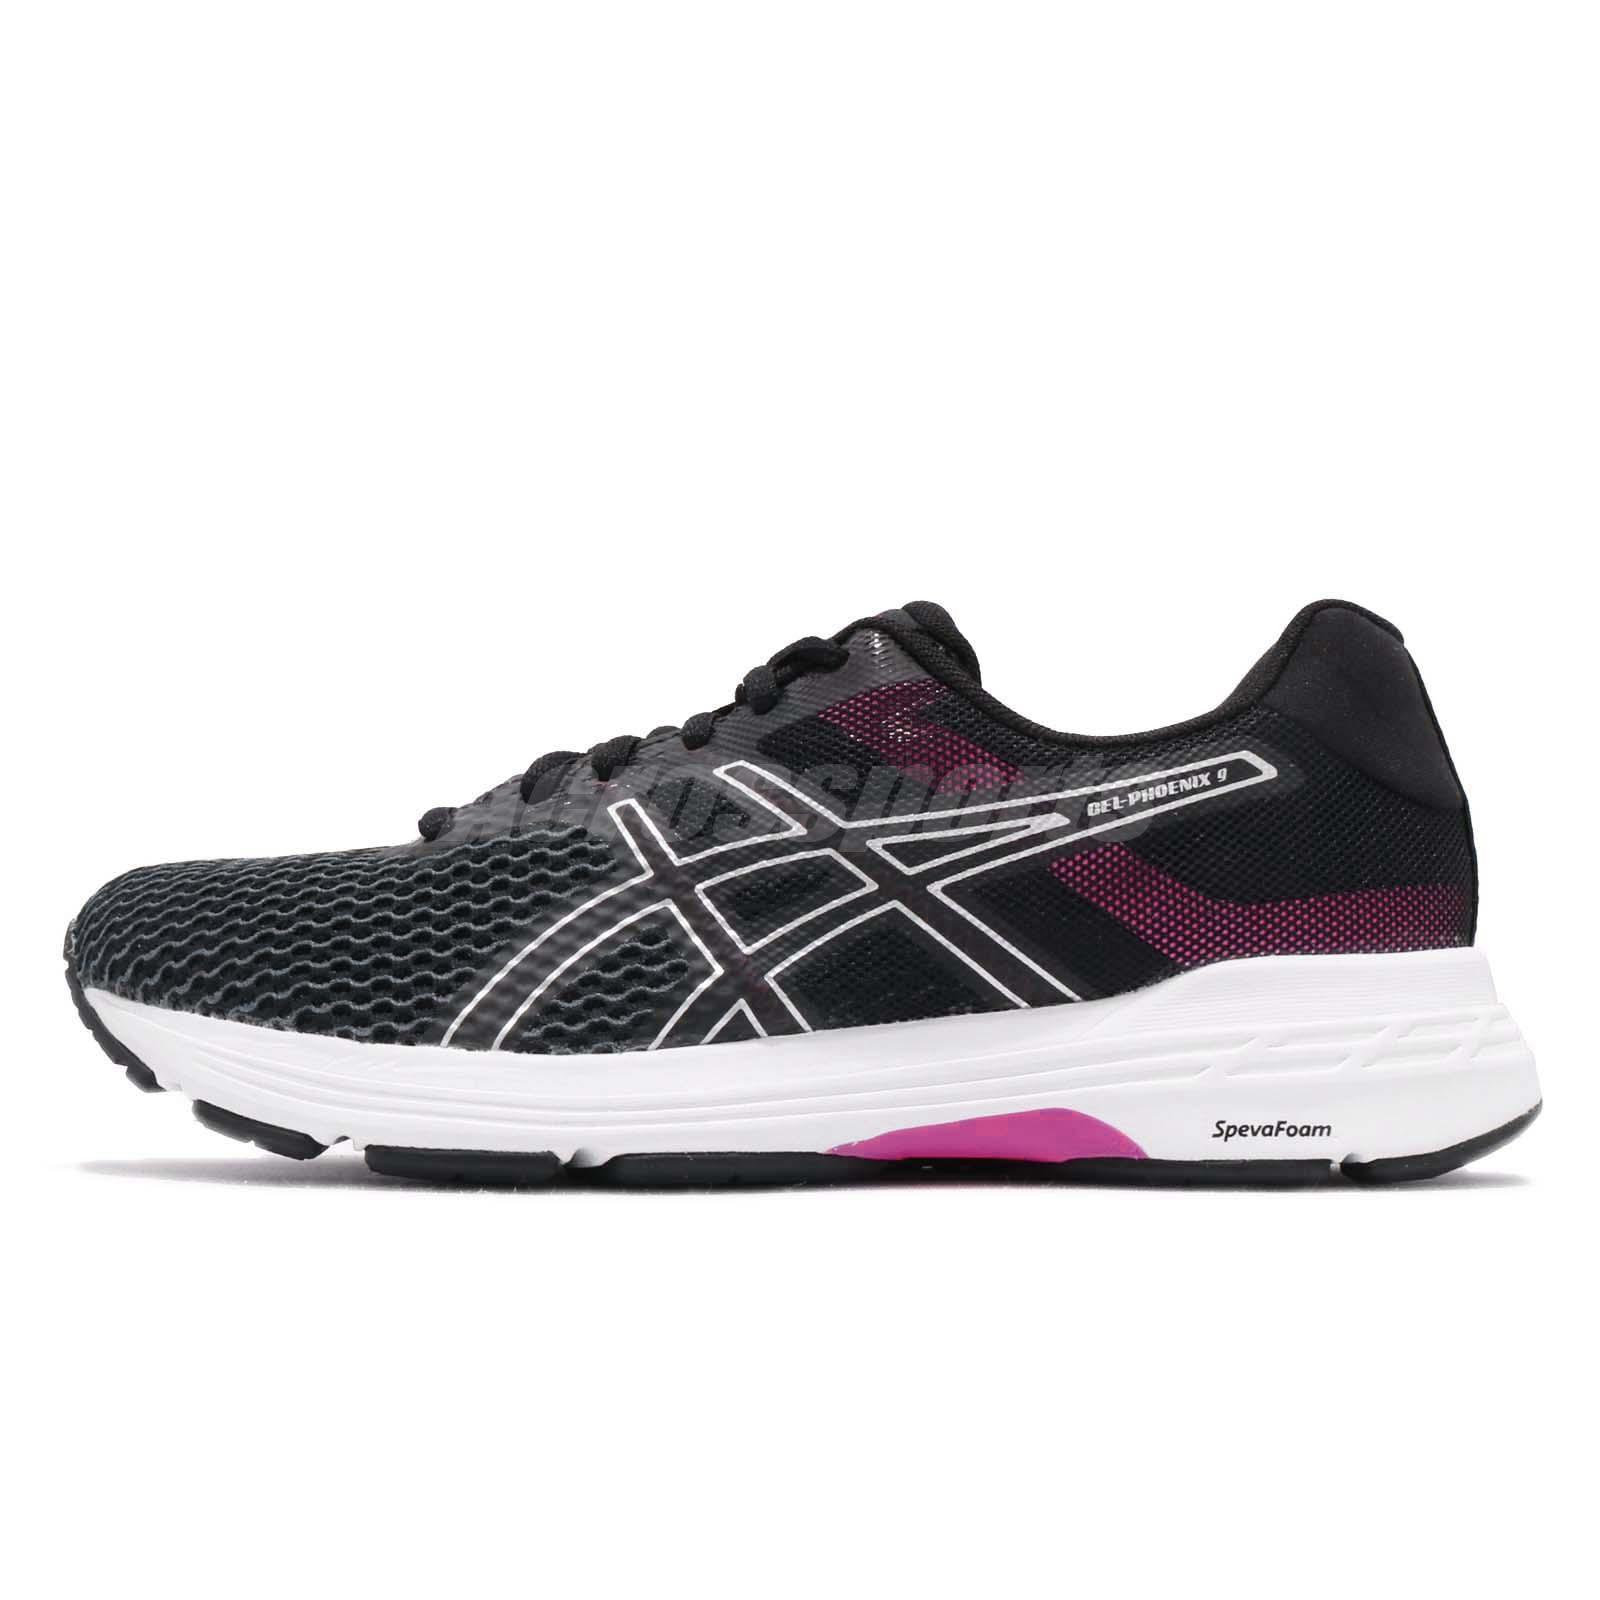 1eb9a4123c58 Asics Gel-Phoenix 9 Black Silver Fuchsia Red Women Running Shoes T872N-9093